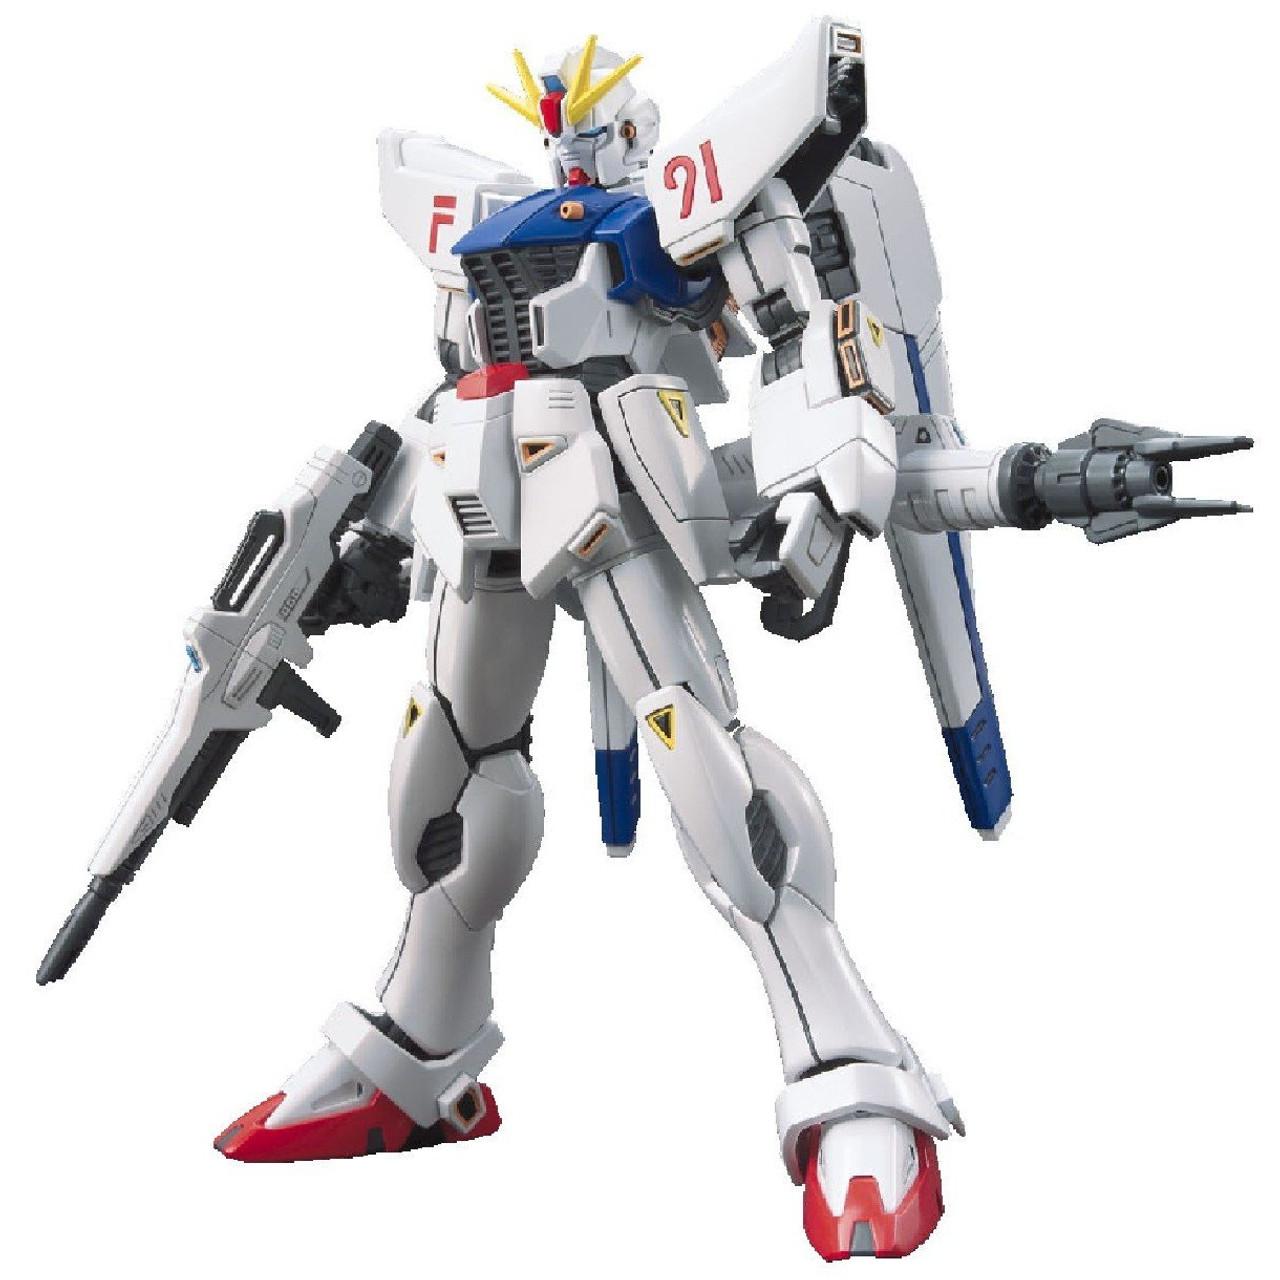 Bandai 1//144 Scale kit HGUC 167 Gundam F91 EFSF Prototype Attack USE Mobile Suit